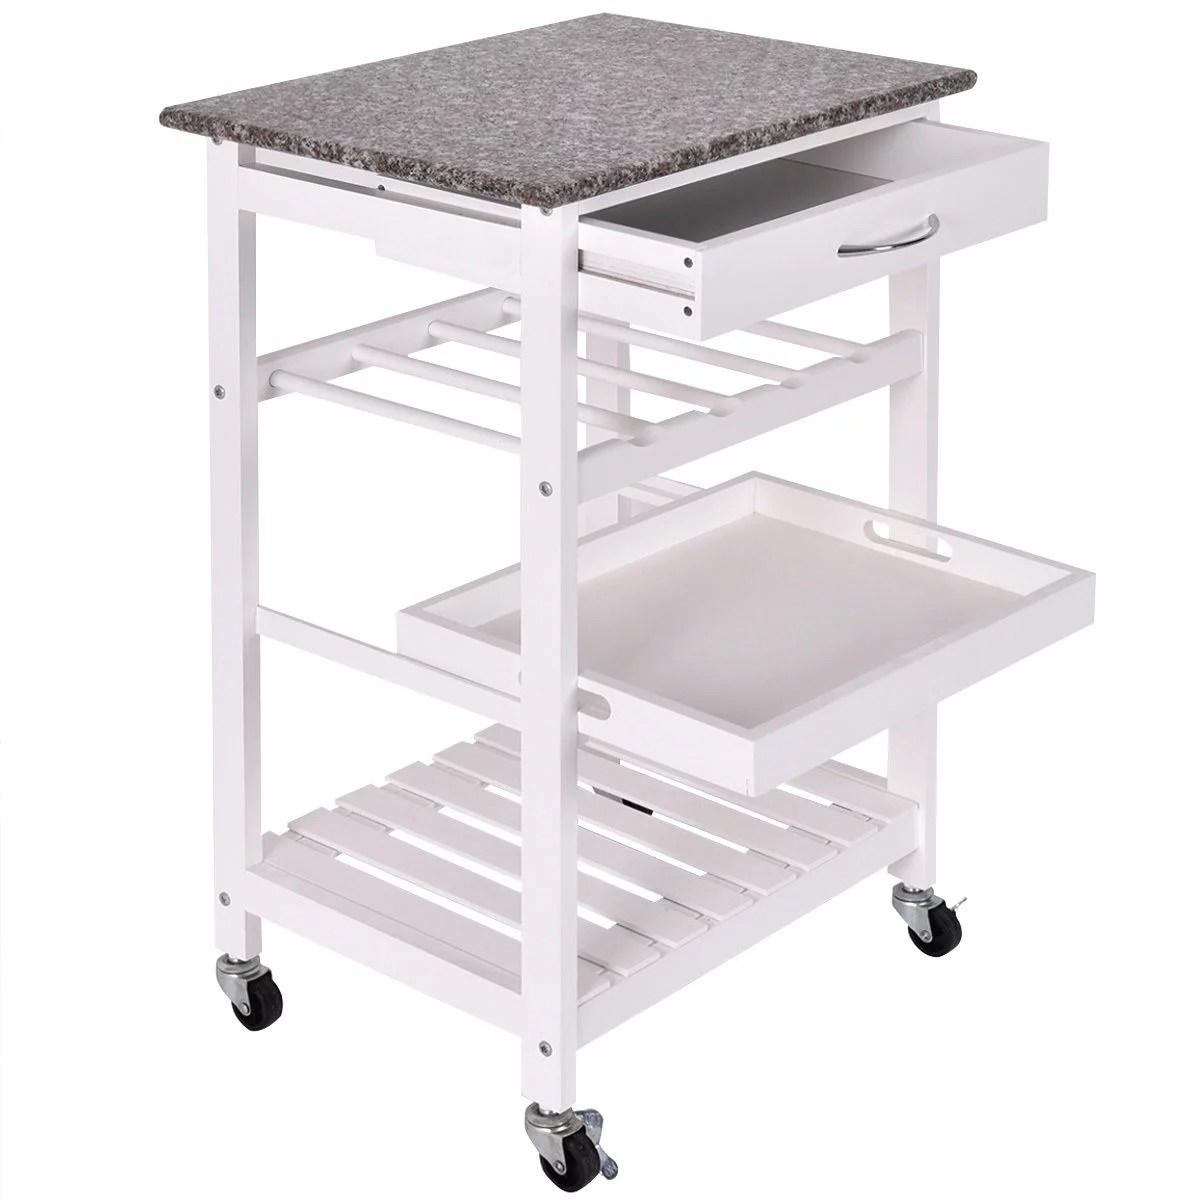 kitchen trolley cart kids play sets 4 tier rolling wood island storage shelf drawer wine rack